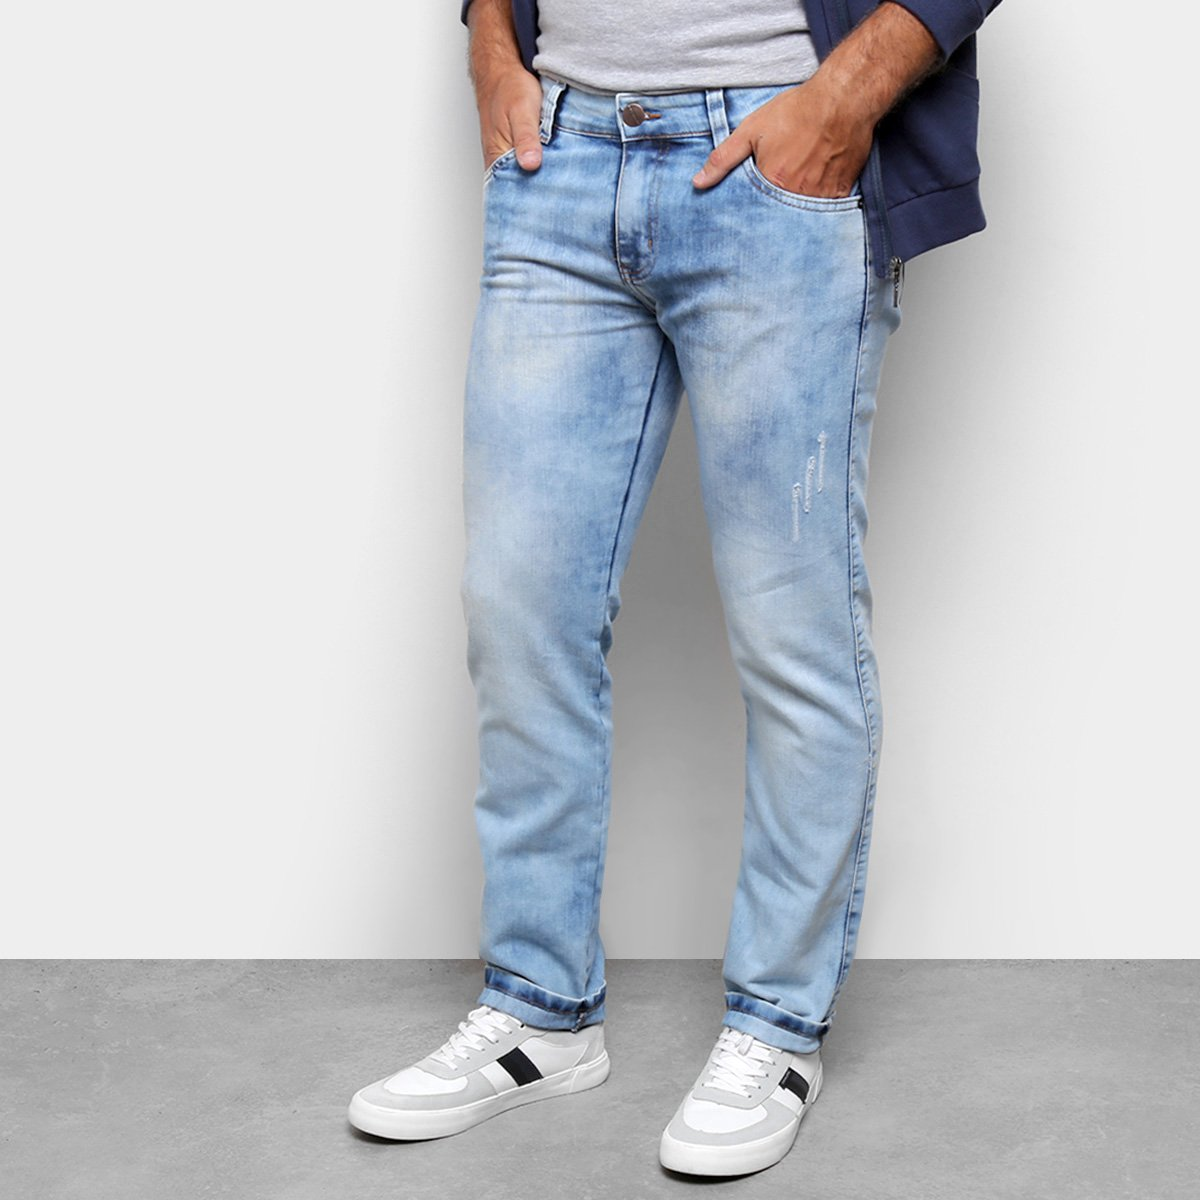 Calça Jeans Ecxo Skinny Marmorizada Masculina